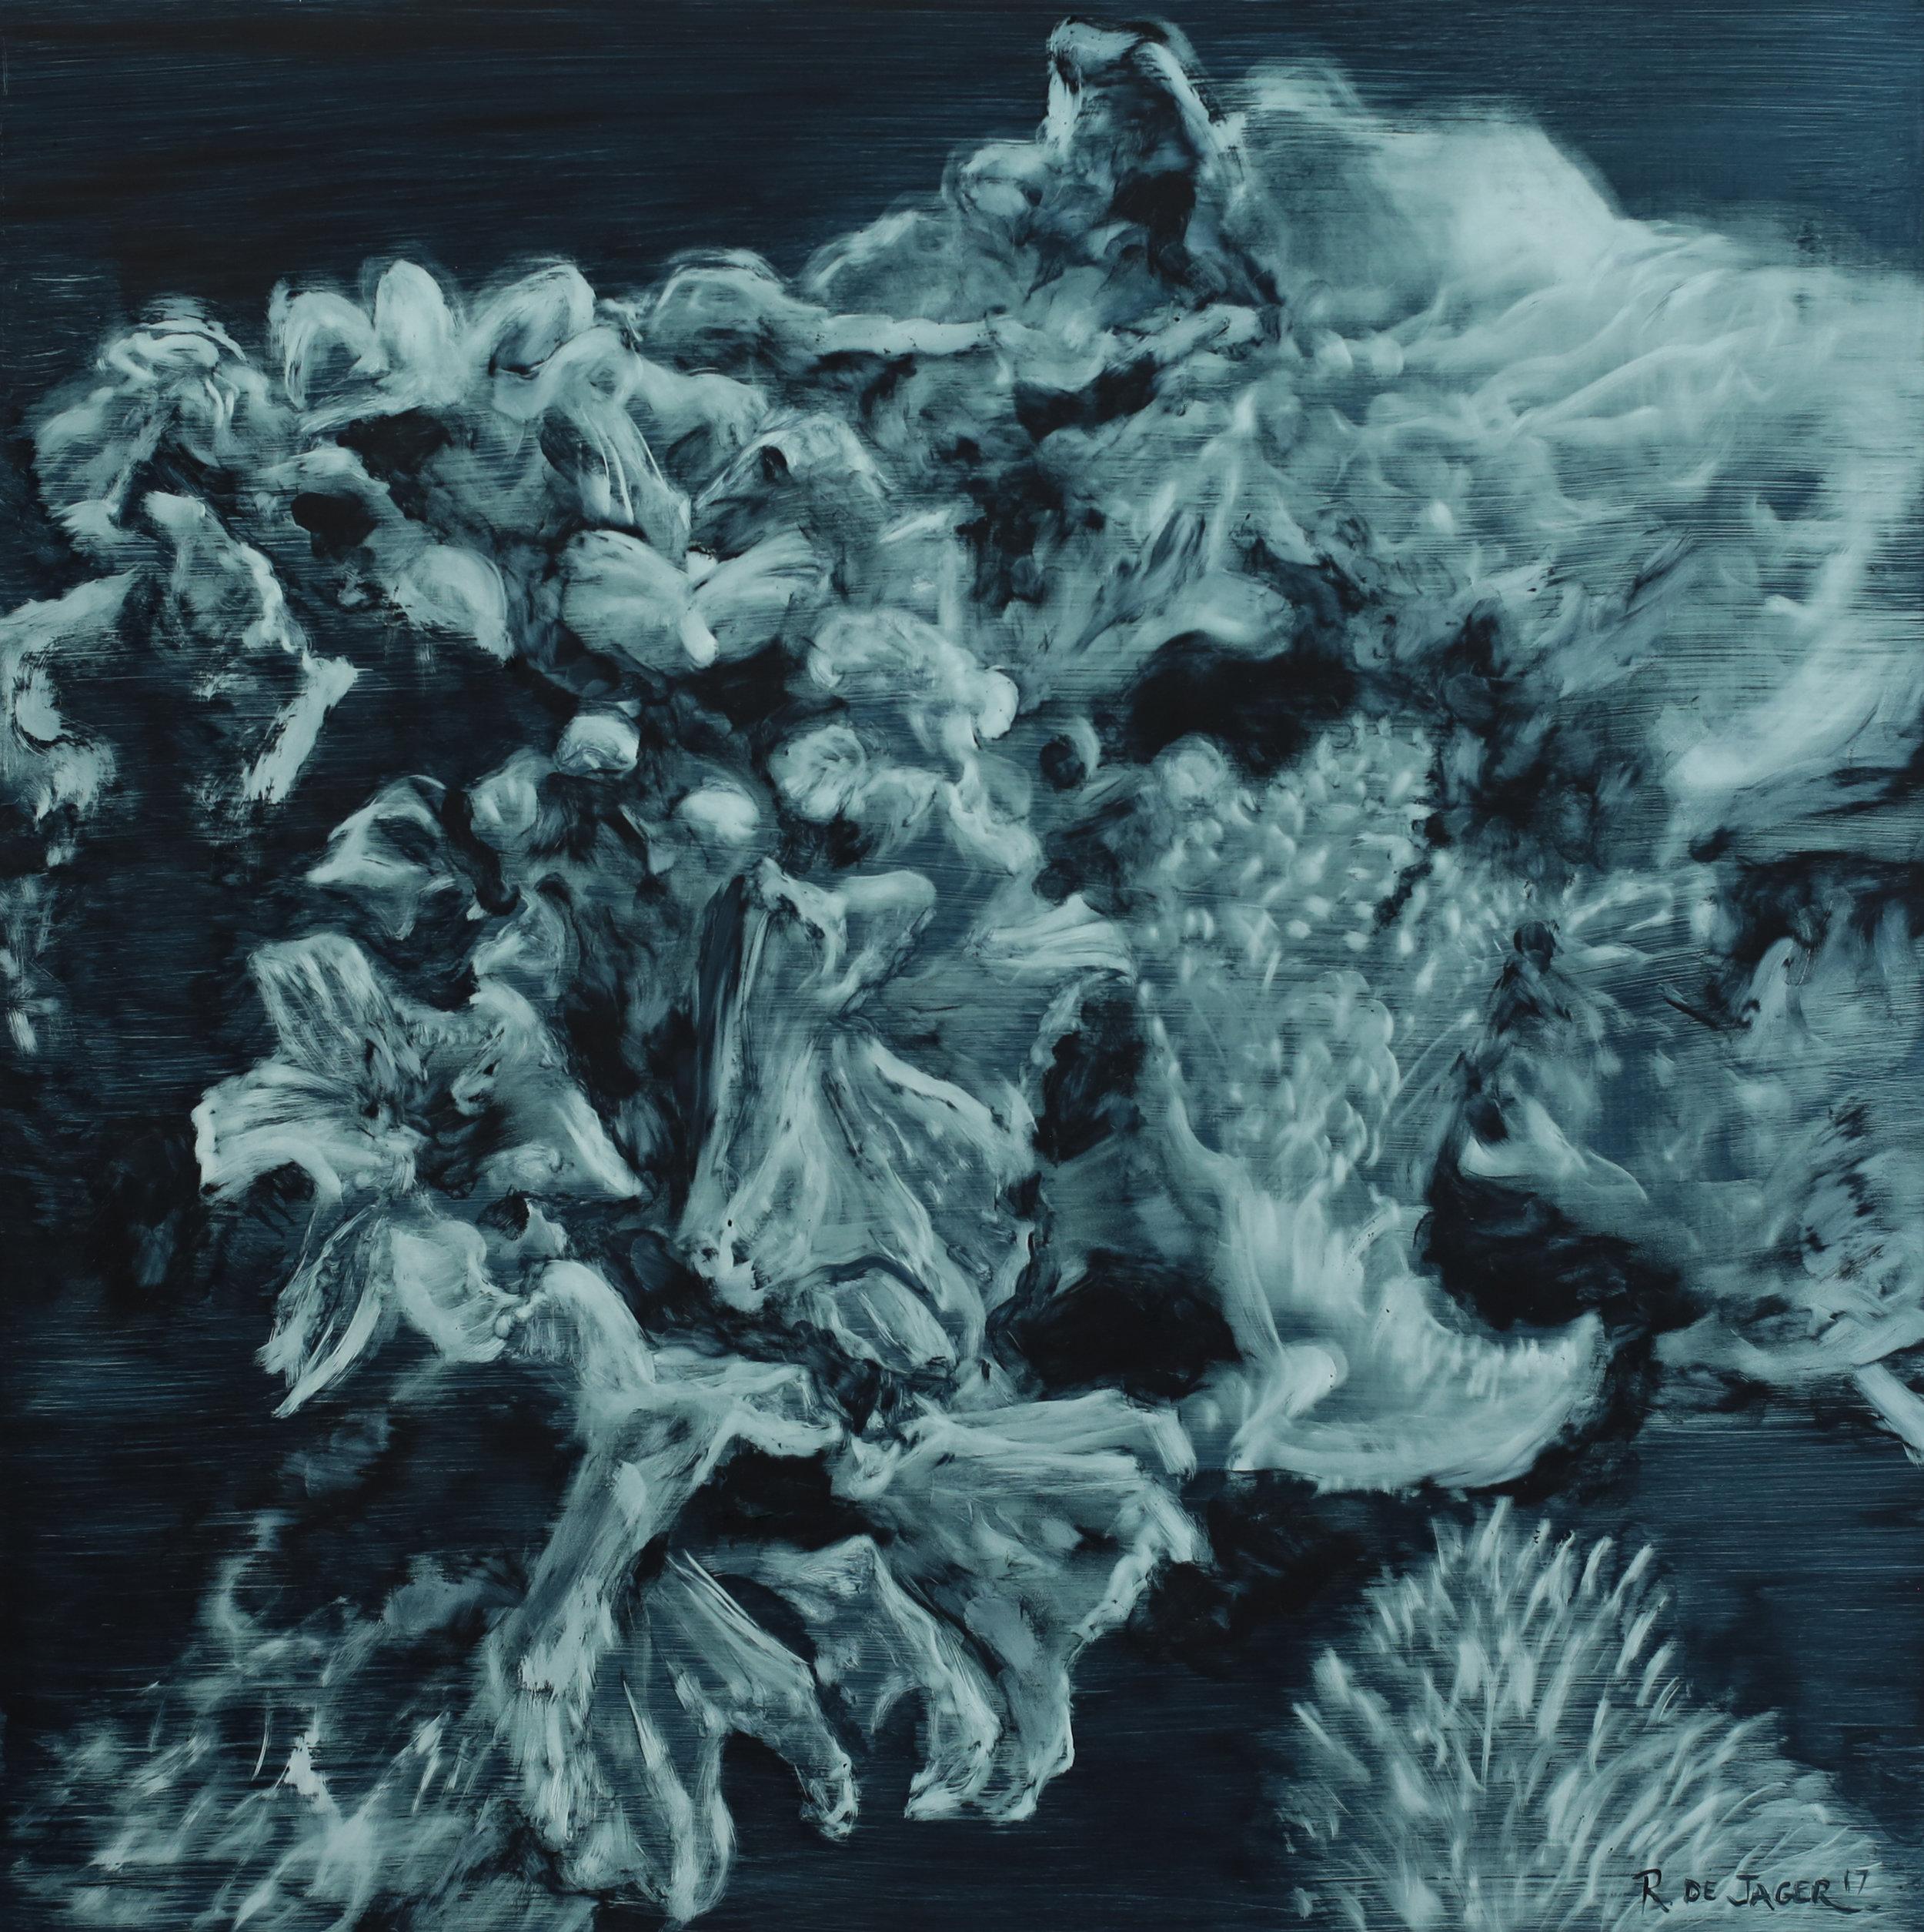 Ronel de Jager. Title TBC 3. 2017. Oil on paper, 50 x 50 cm.jpg